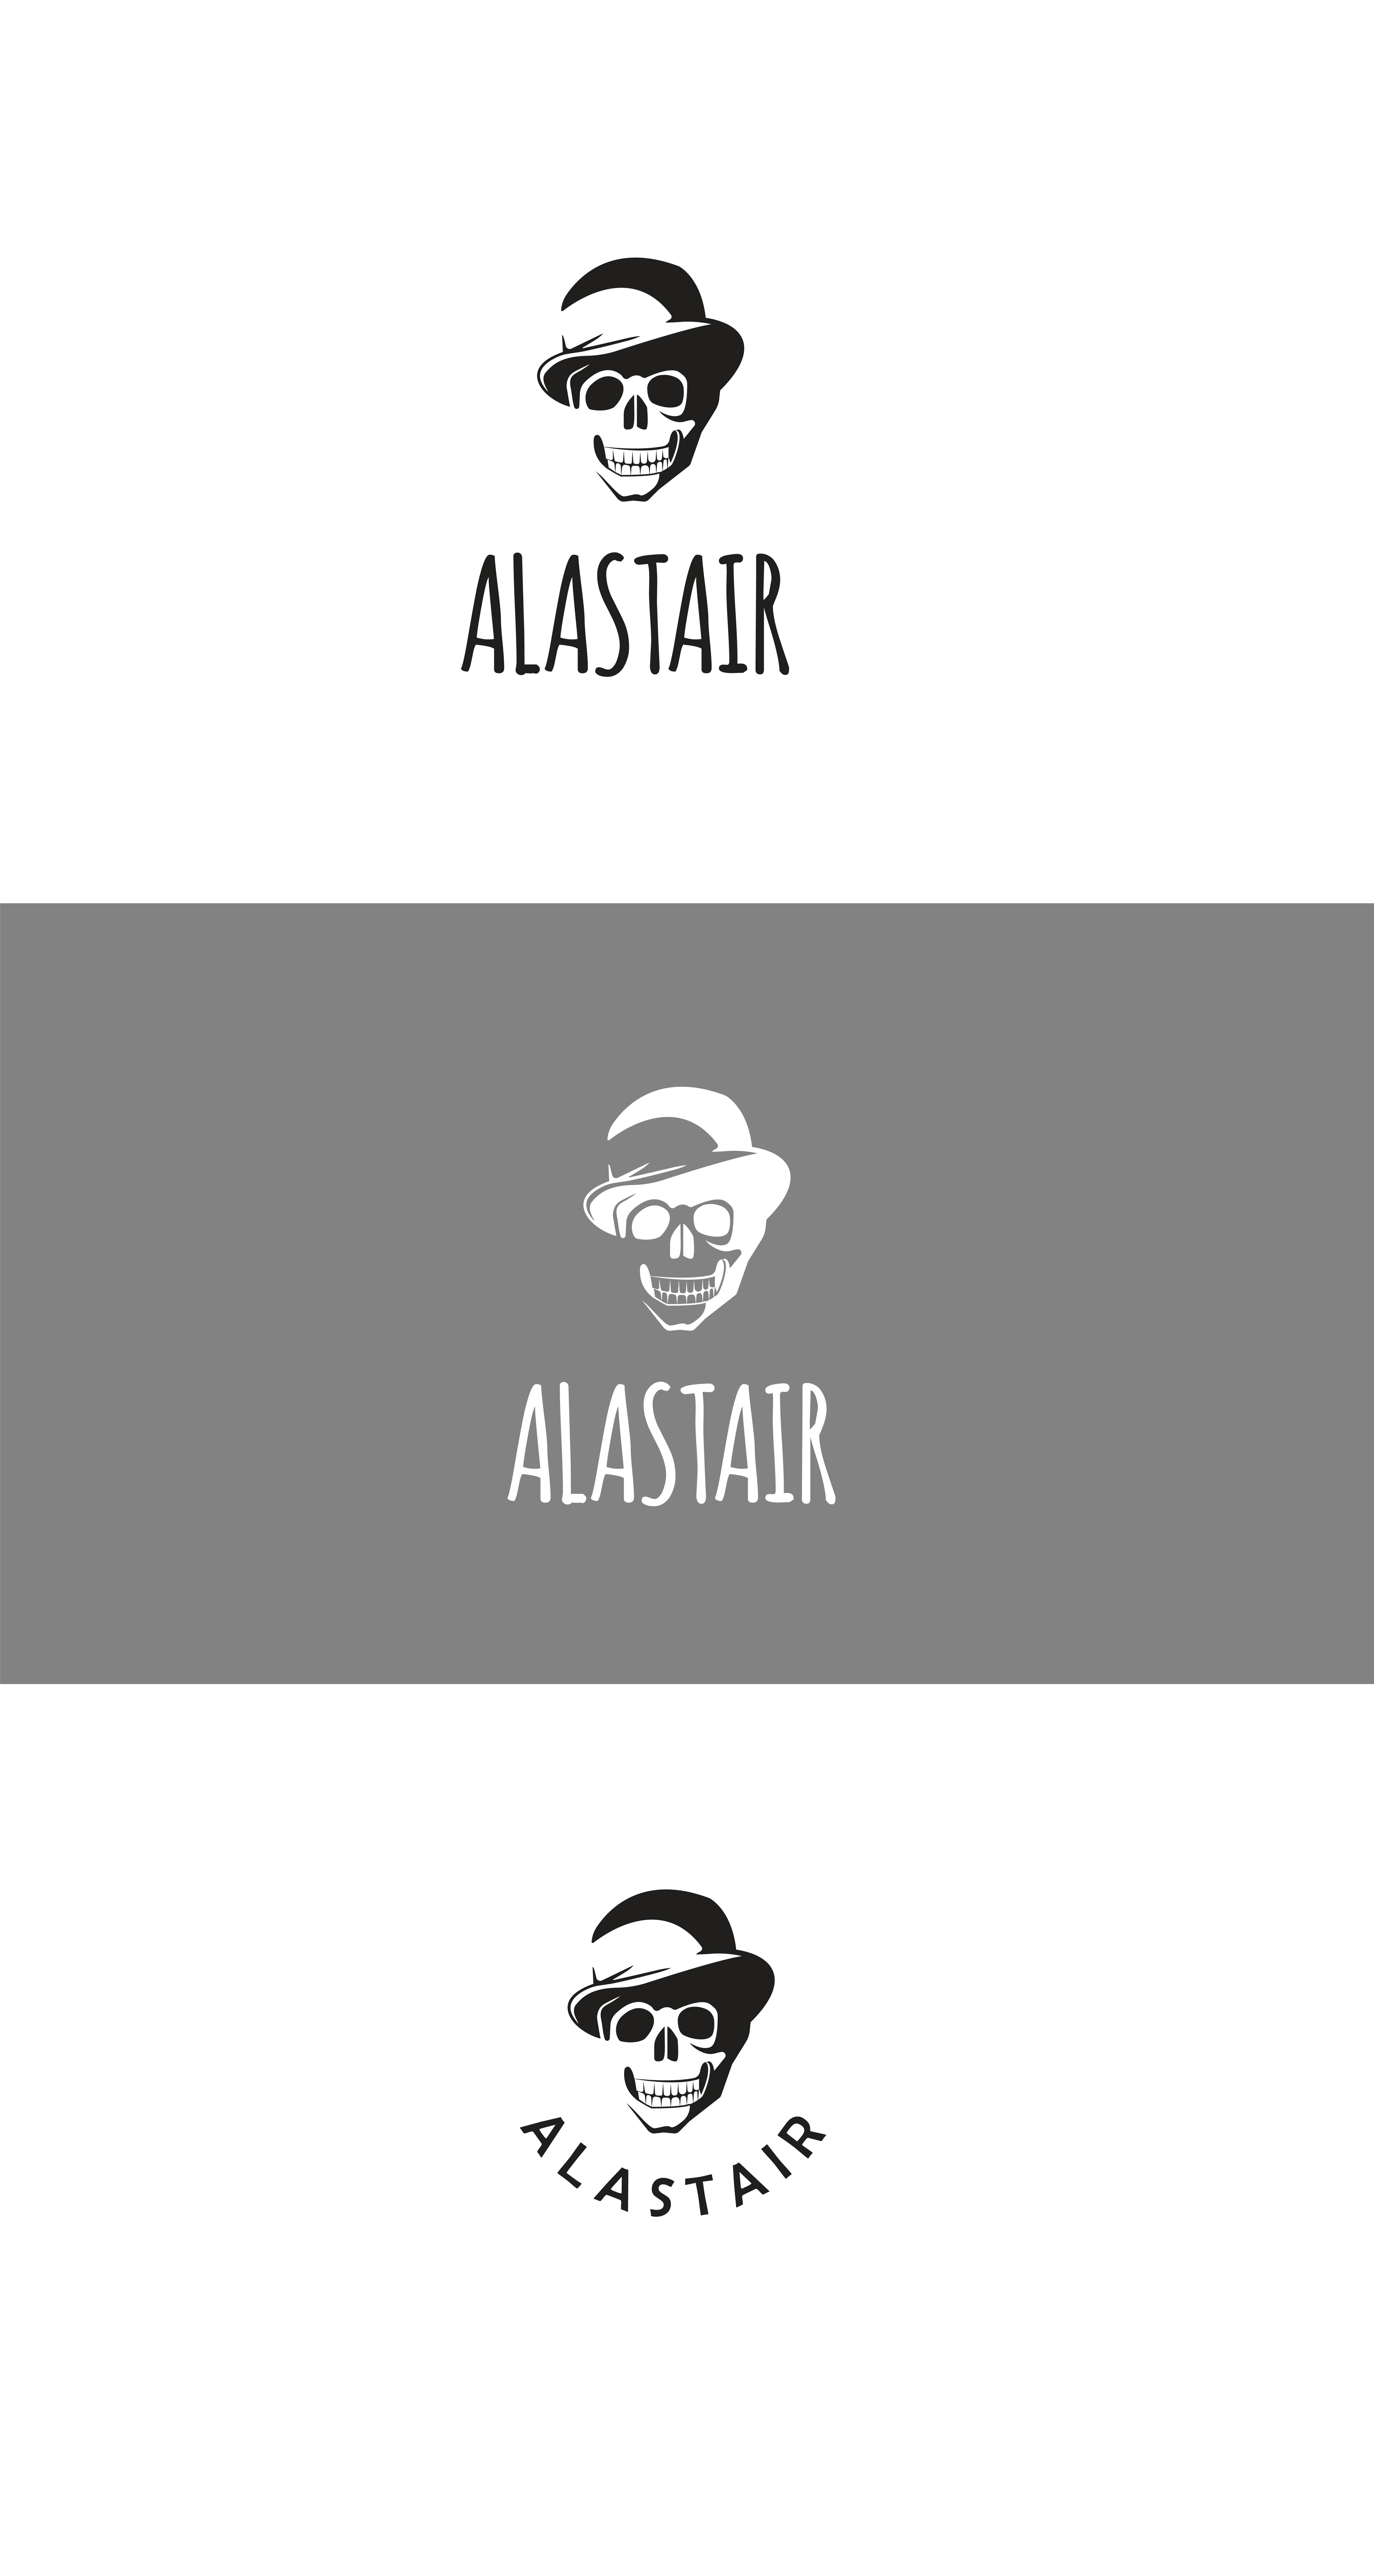 Фото Разработка дизайна логотипа для интернет-магазина рок-атрибутики «Alastair» Вариант 6